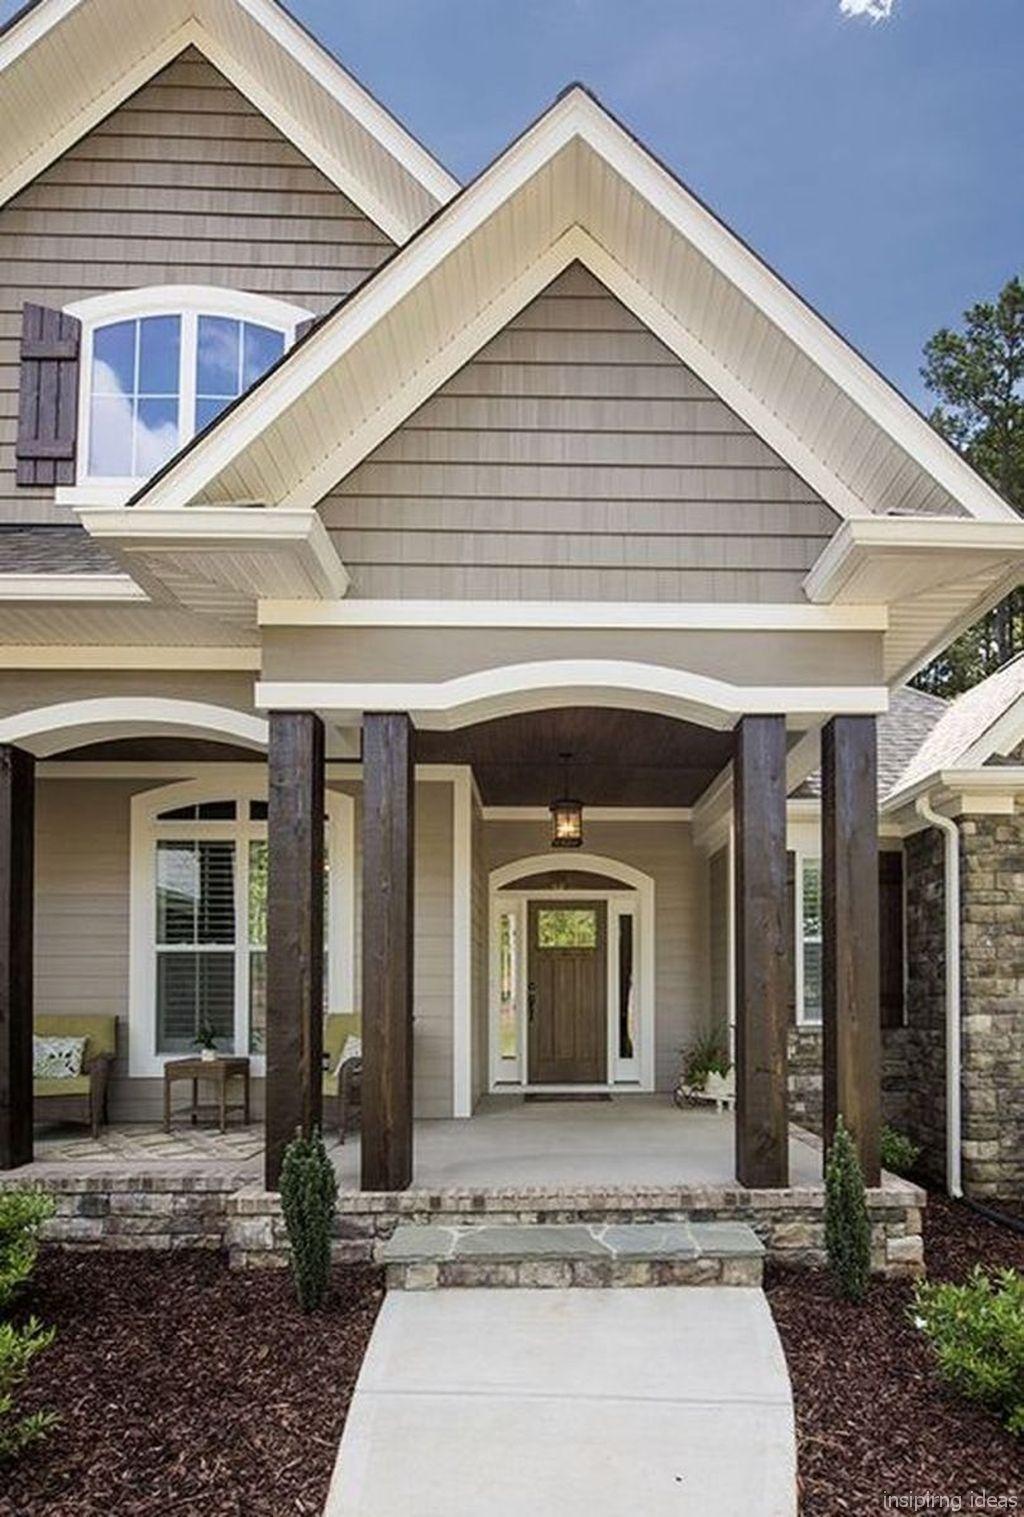 Adorable simple modern farmhouse exterior design ideas https roomaholic also split level homes home designs  door ing house colors rh pinterest